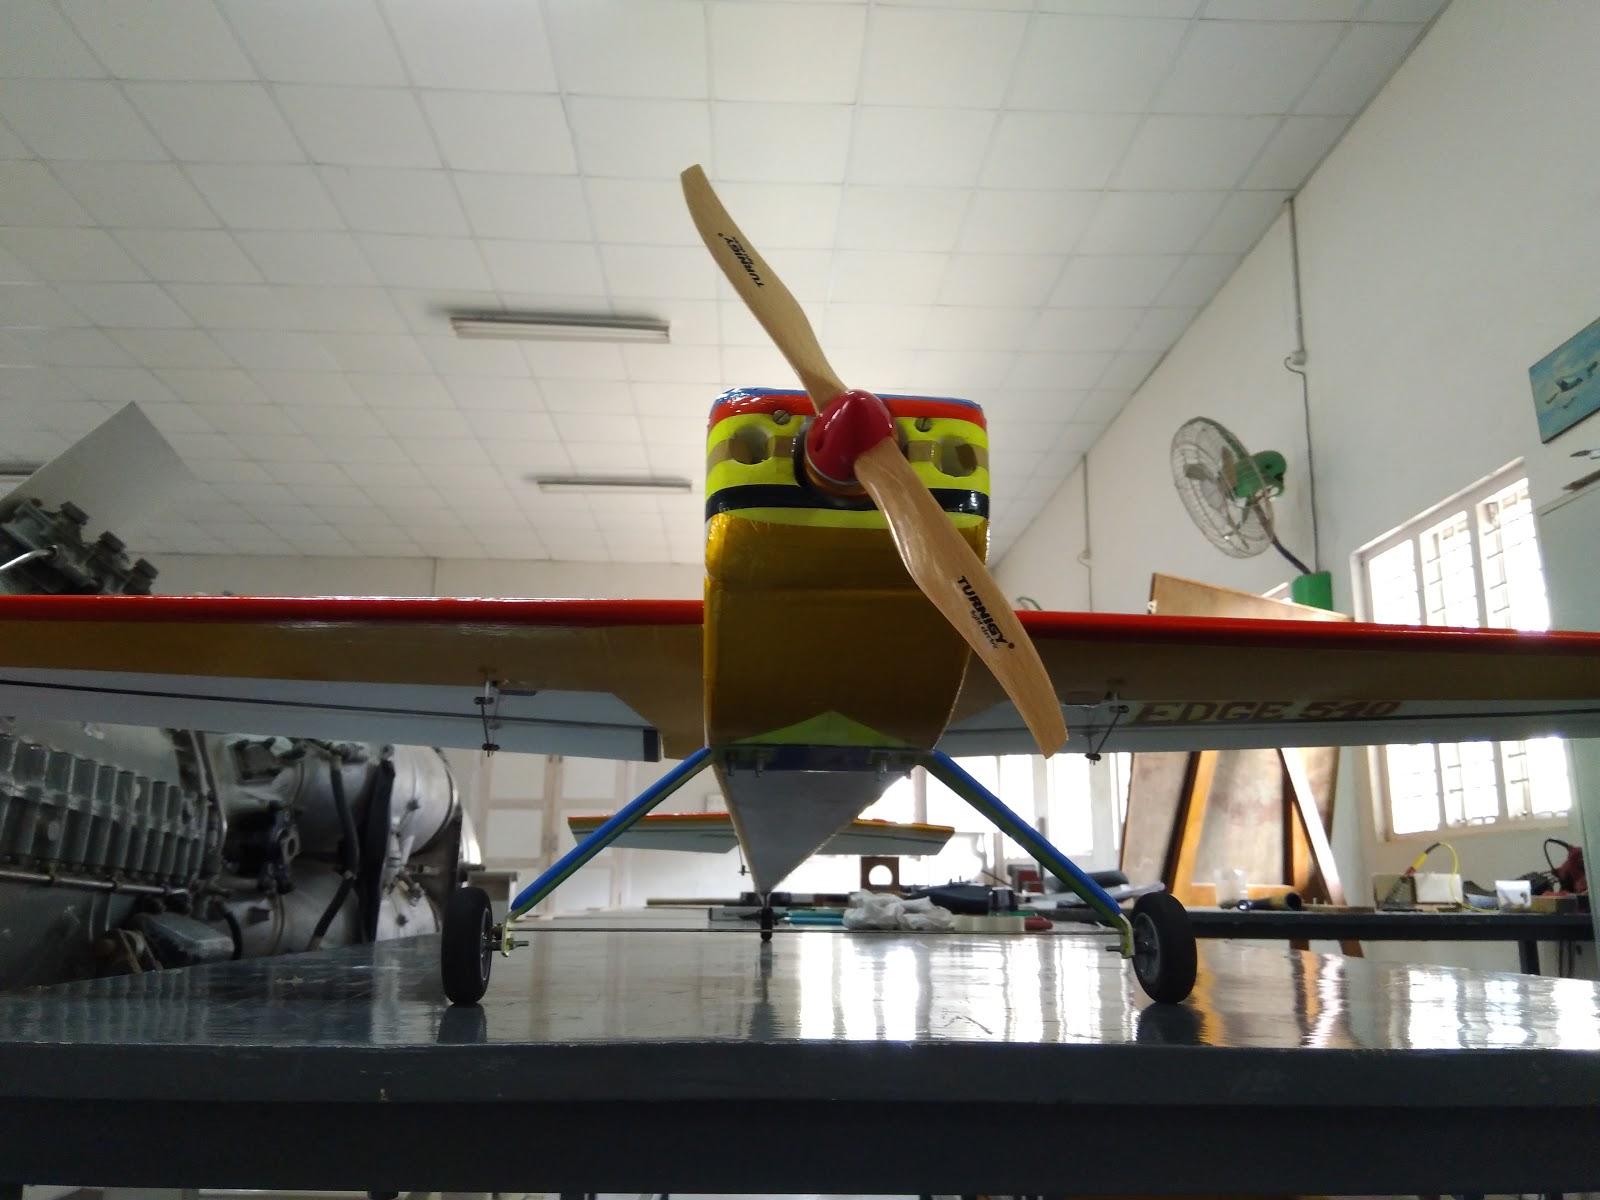 Gforce-RC Planes: My Inspiration